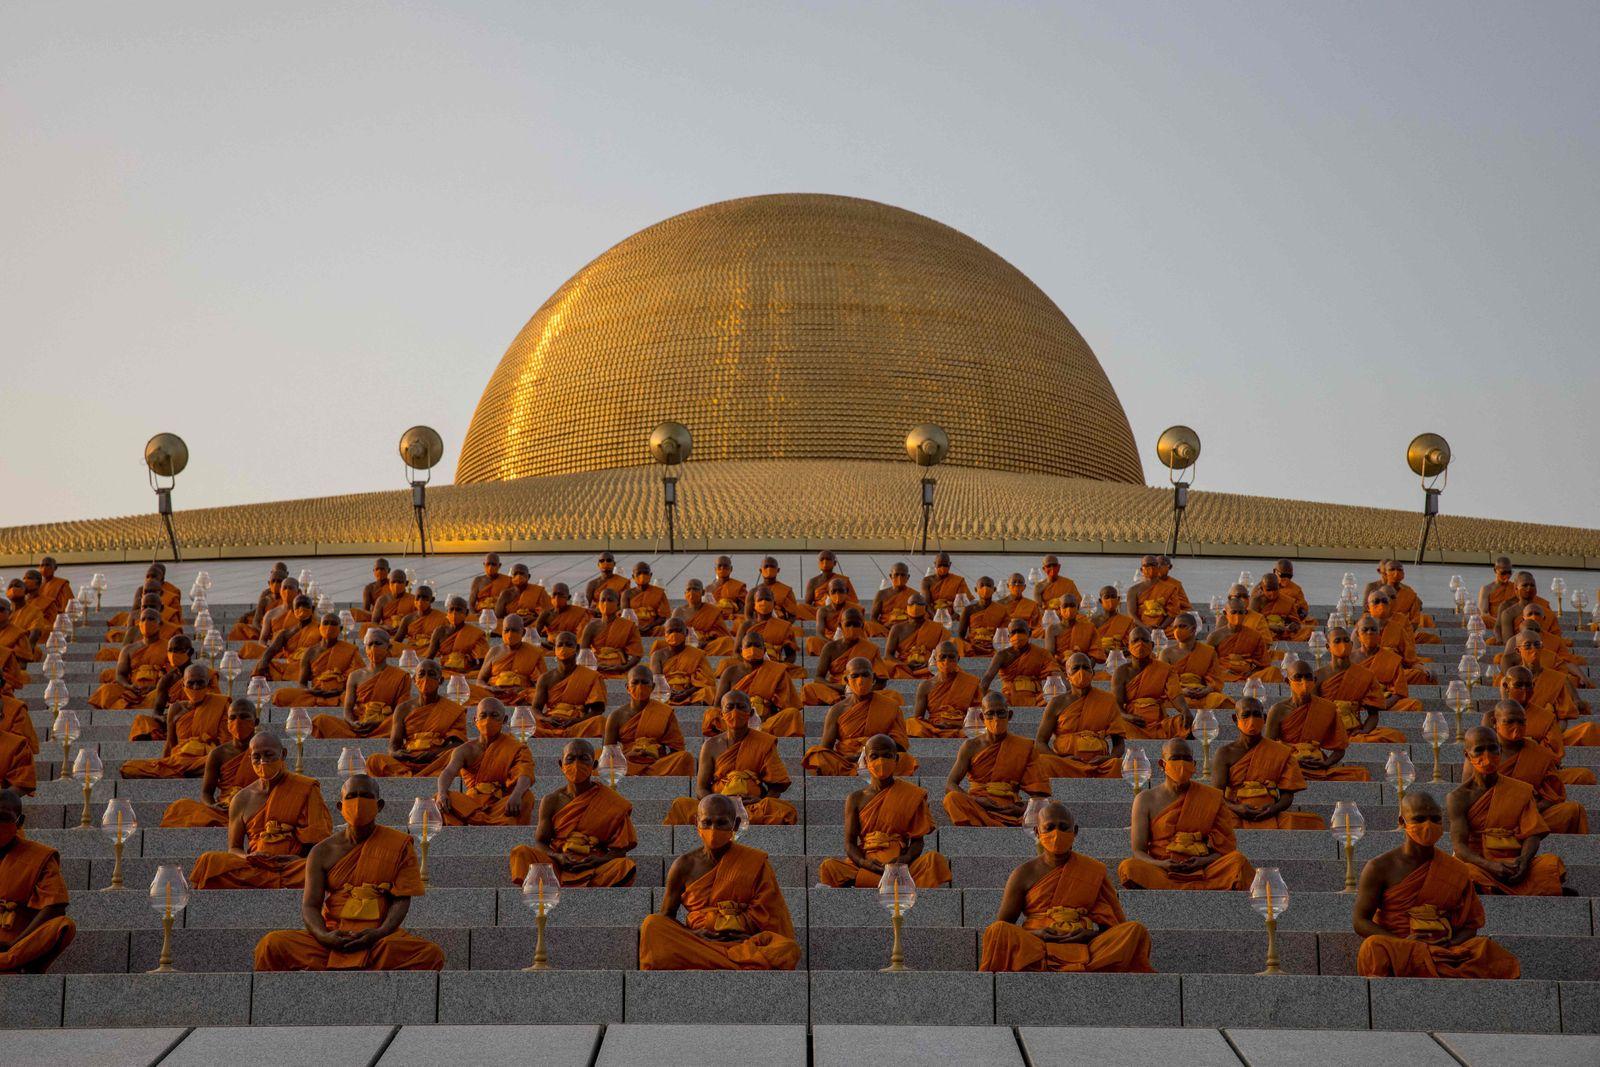 TOPSHOT-THAILAND-RELIGION-HOLIDAY